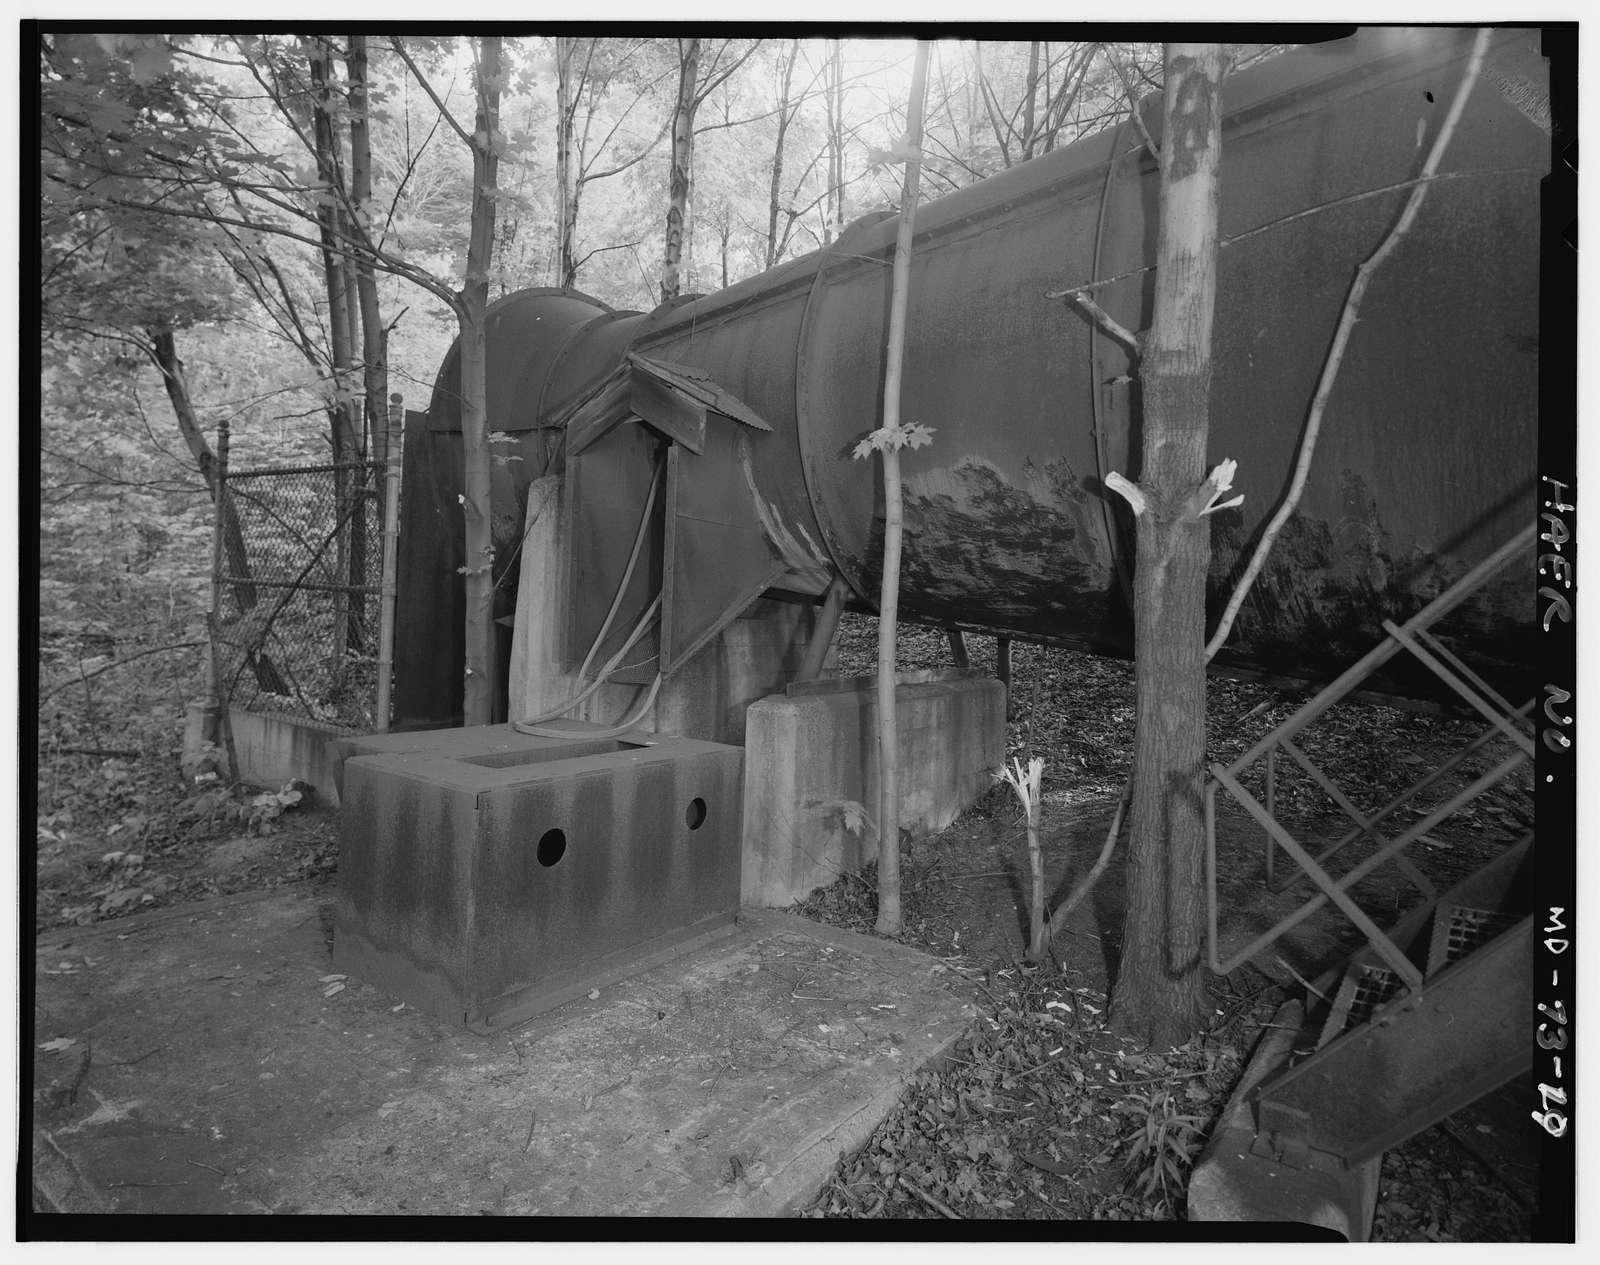 Ocean Mine No. 1 Complex, Powerhouse & Ventilation Fan, Midland, Allegany County, MD